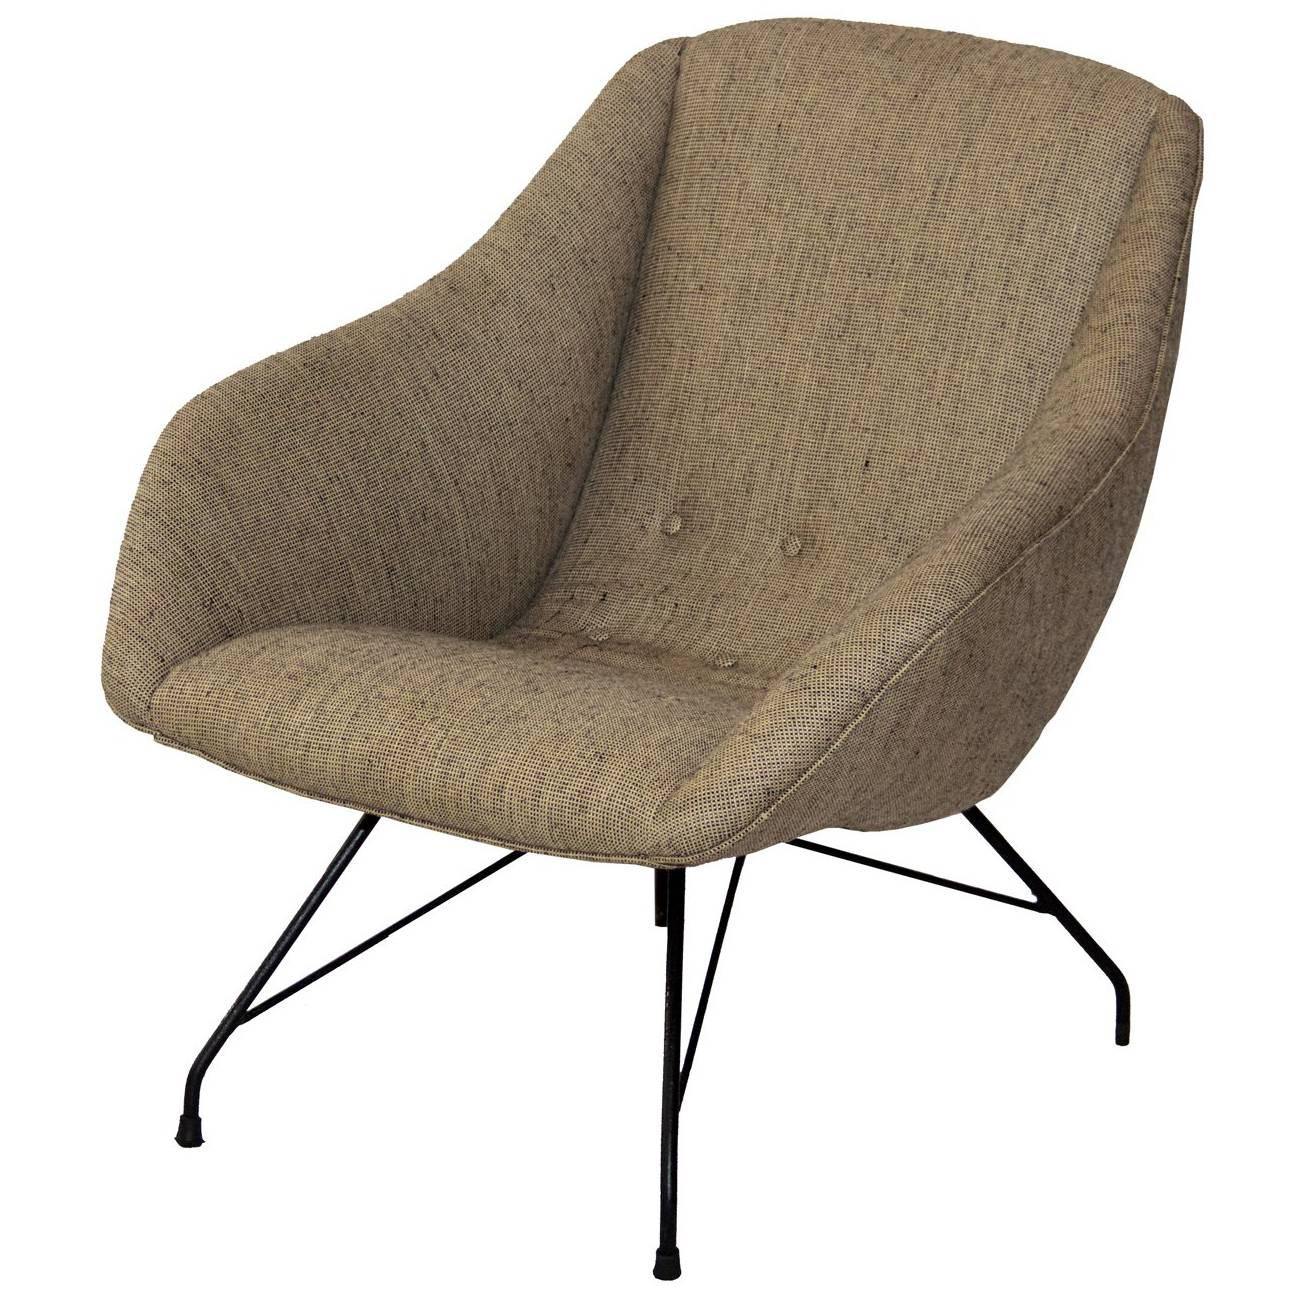 Carlo Hauner and Martin Eisler Midcentury brazilian armchair, 1955